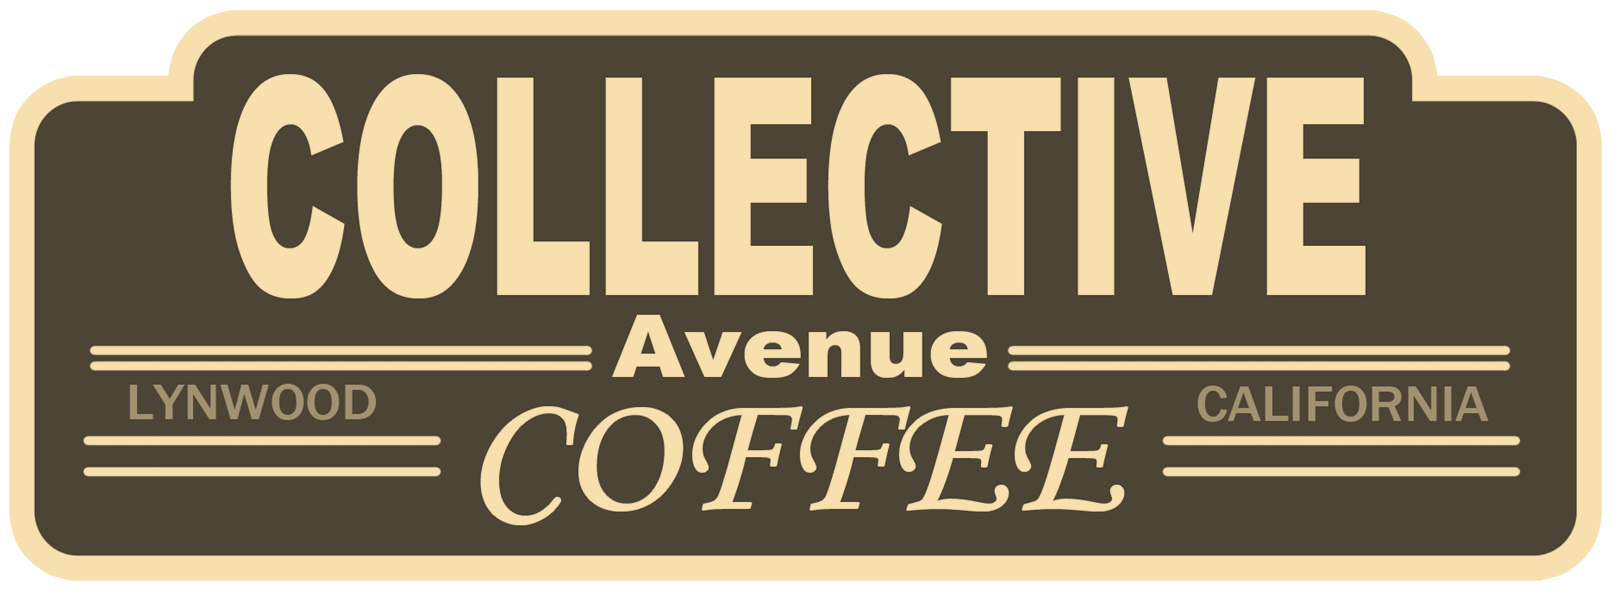 Collective Avenue Coffee